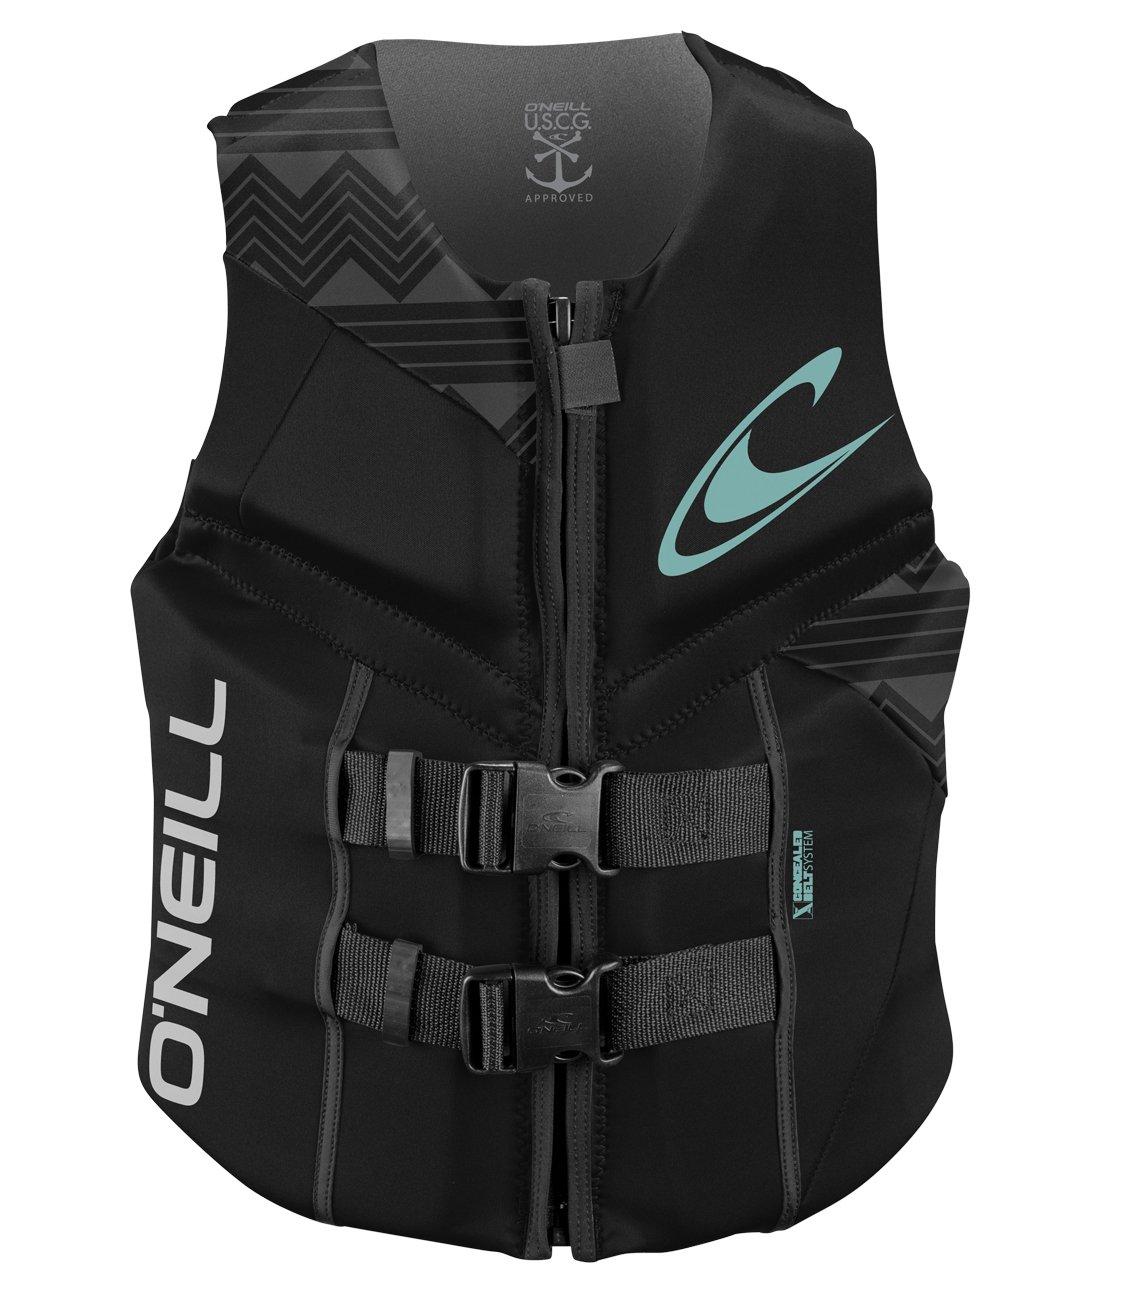 ONeill Wetsuits Womens Reactor USCG Life Vest Black//Black//Black 10